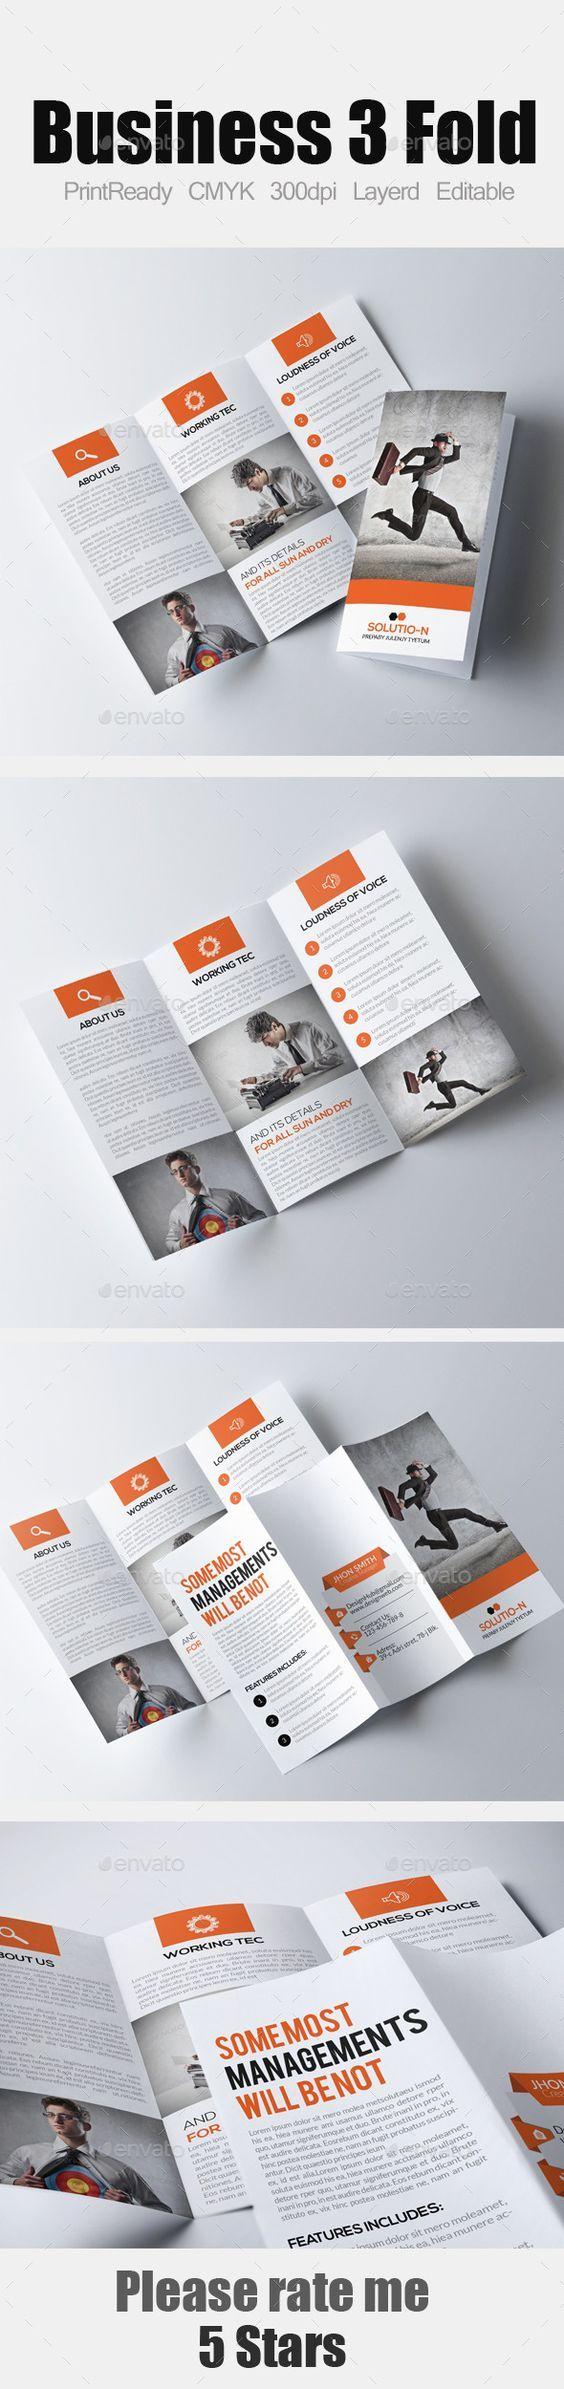 Tri Fold Business Brochure Template #design Download: http://graphicriver.net/item/tri-fold-business-brochure/12209493?ref=ksioks: